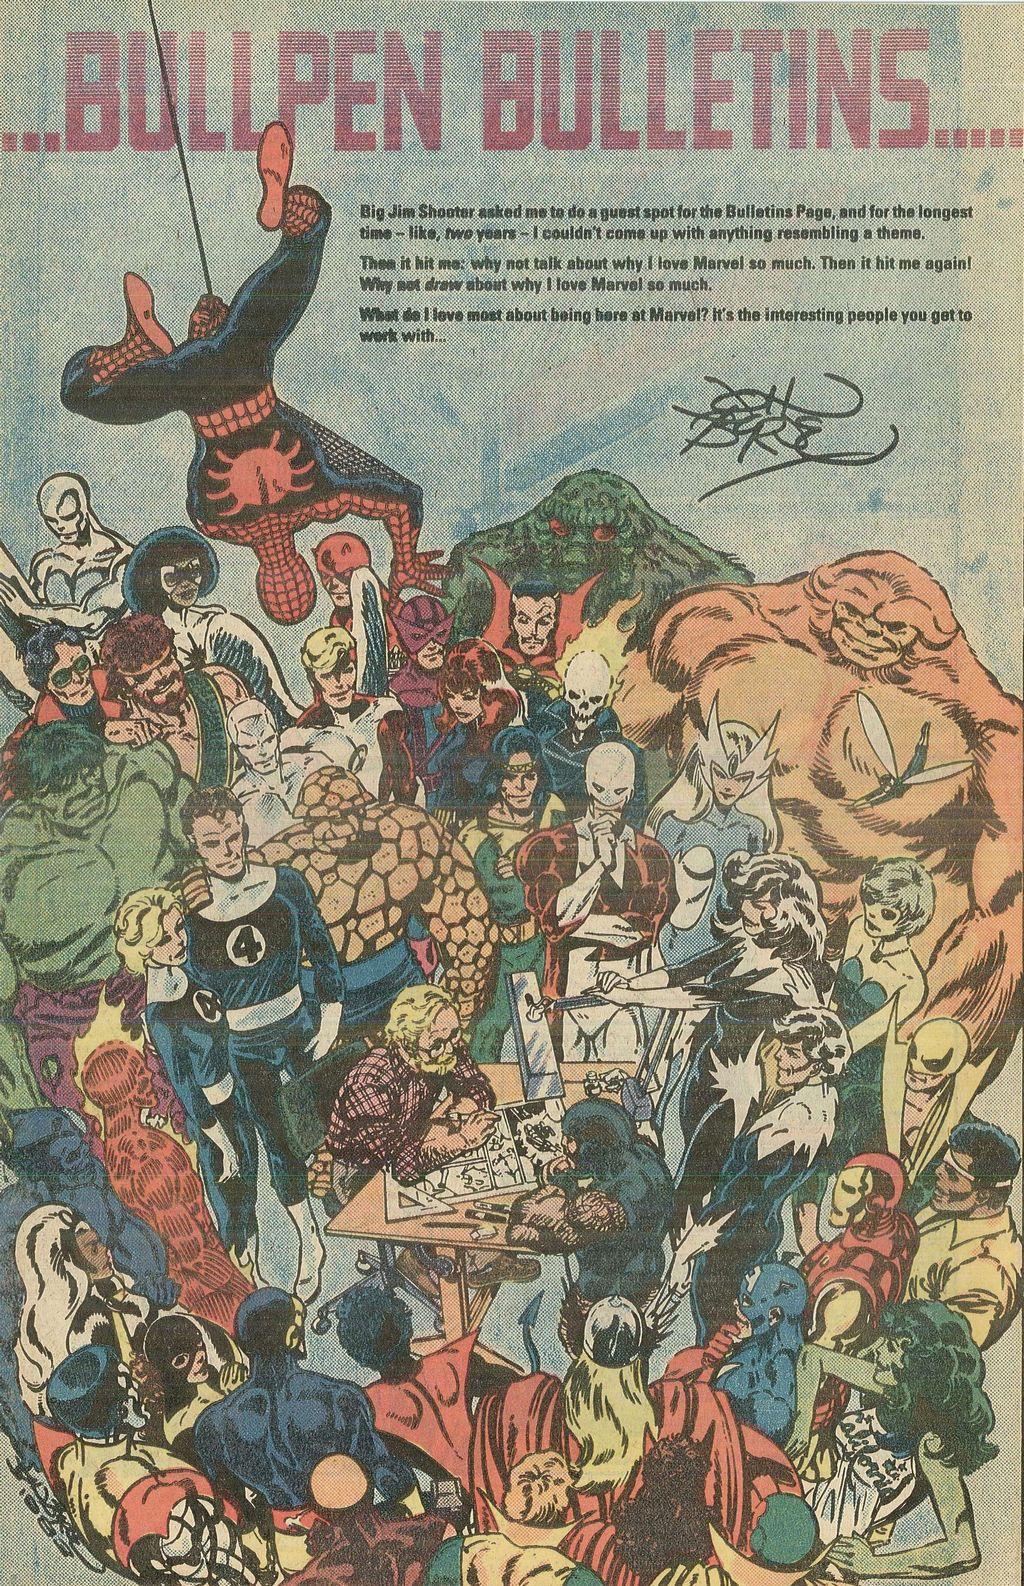 Read online U.S. 1 comic -  Issue #5 - 30